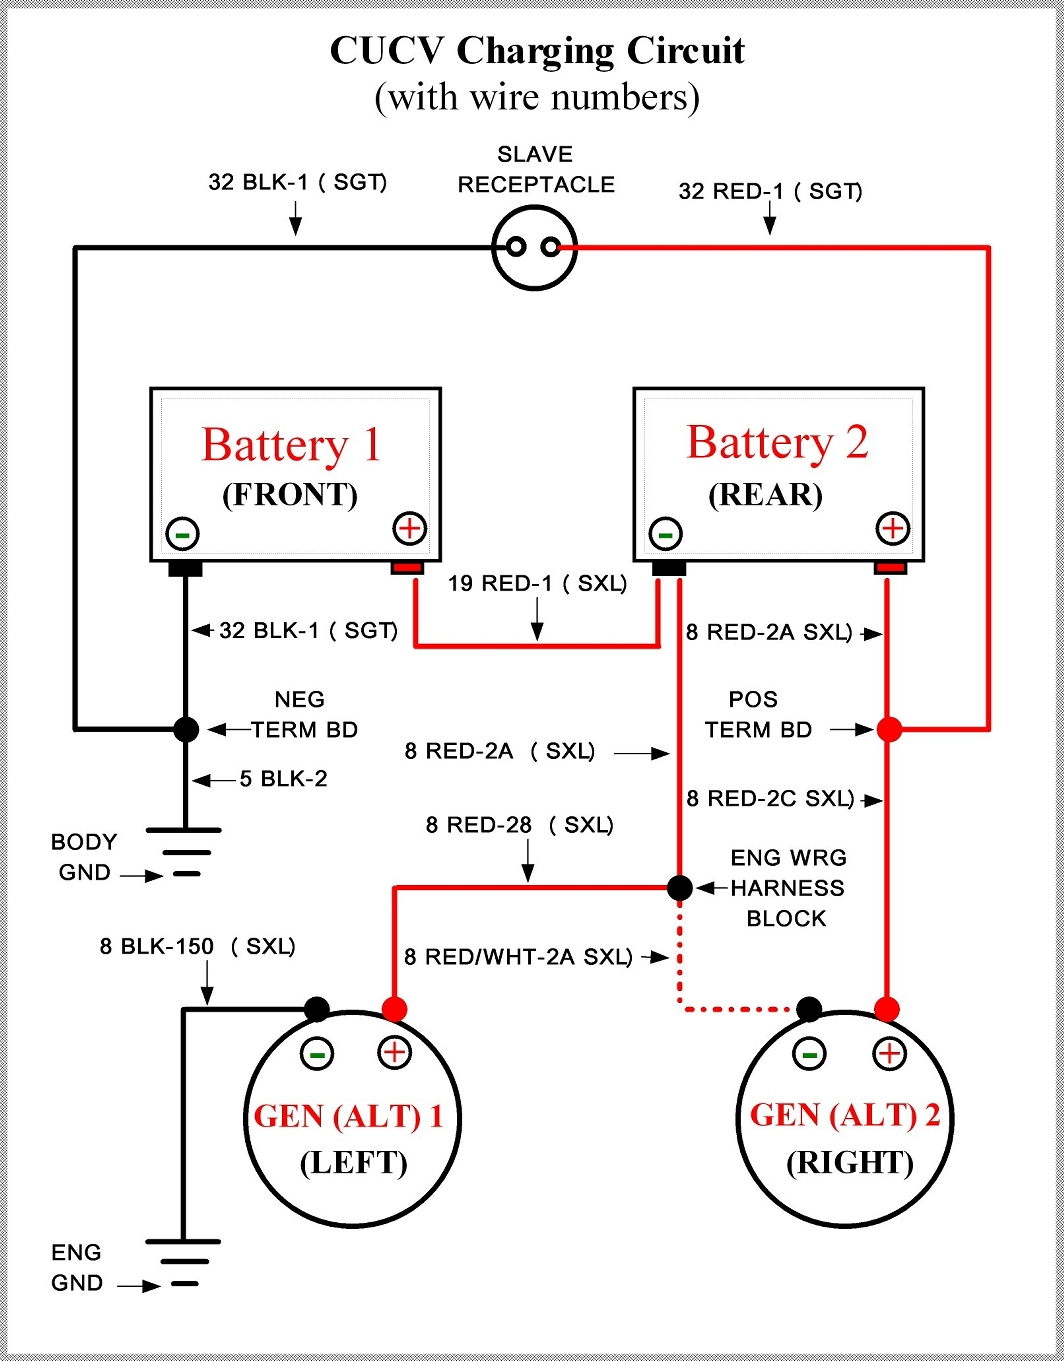 cucv wiring diagram koala food web unique battery screw up on 09